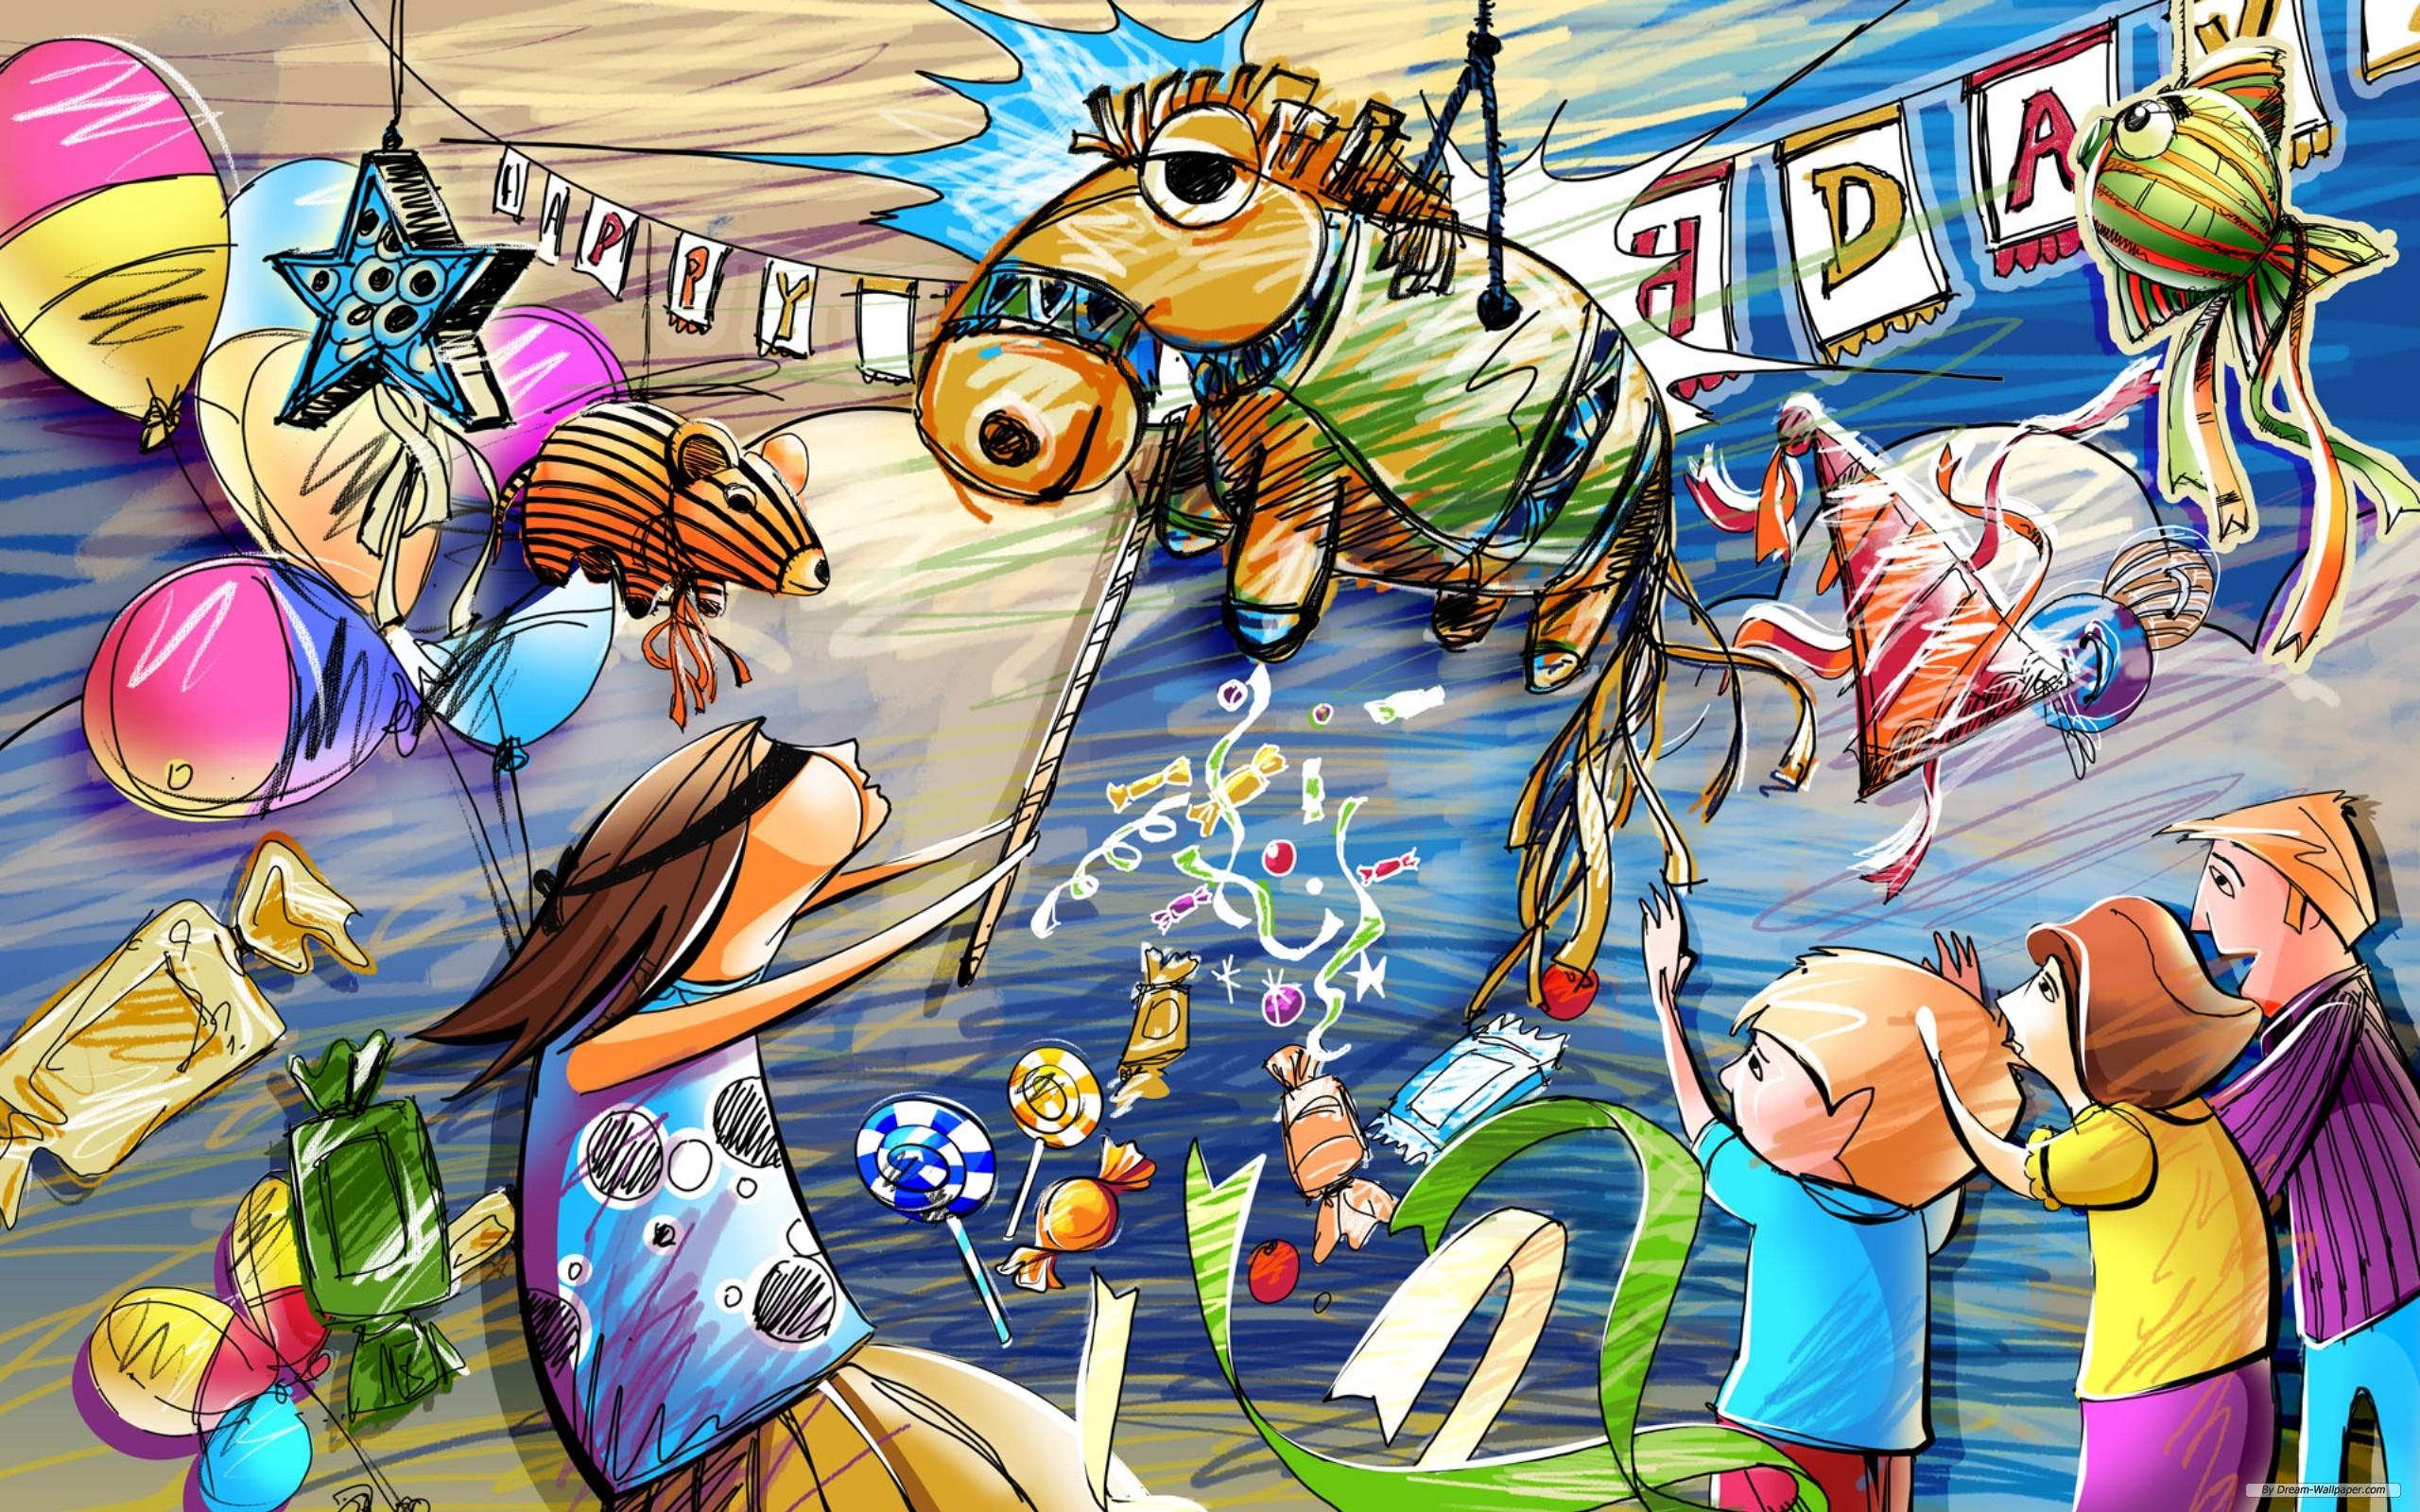 Free Download Pink Panther Cartoons Tom Jerry Smurfs   kootation  HD Wallpaper